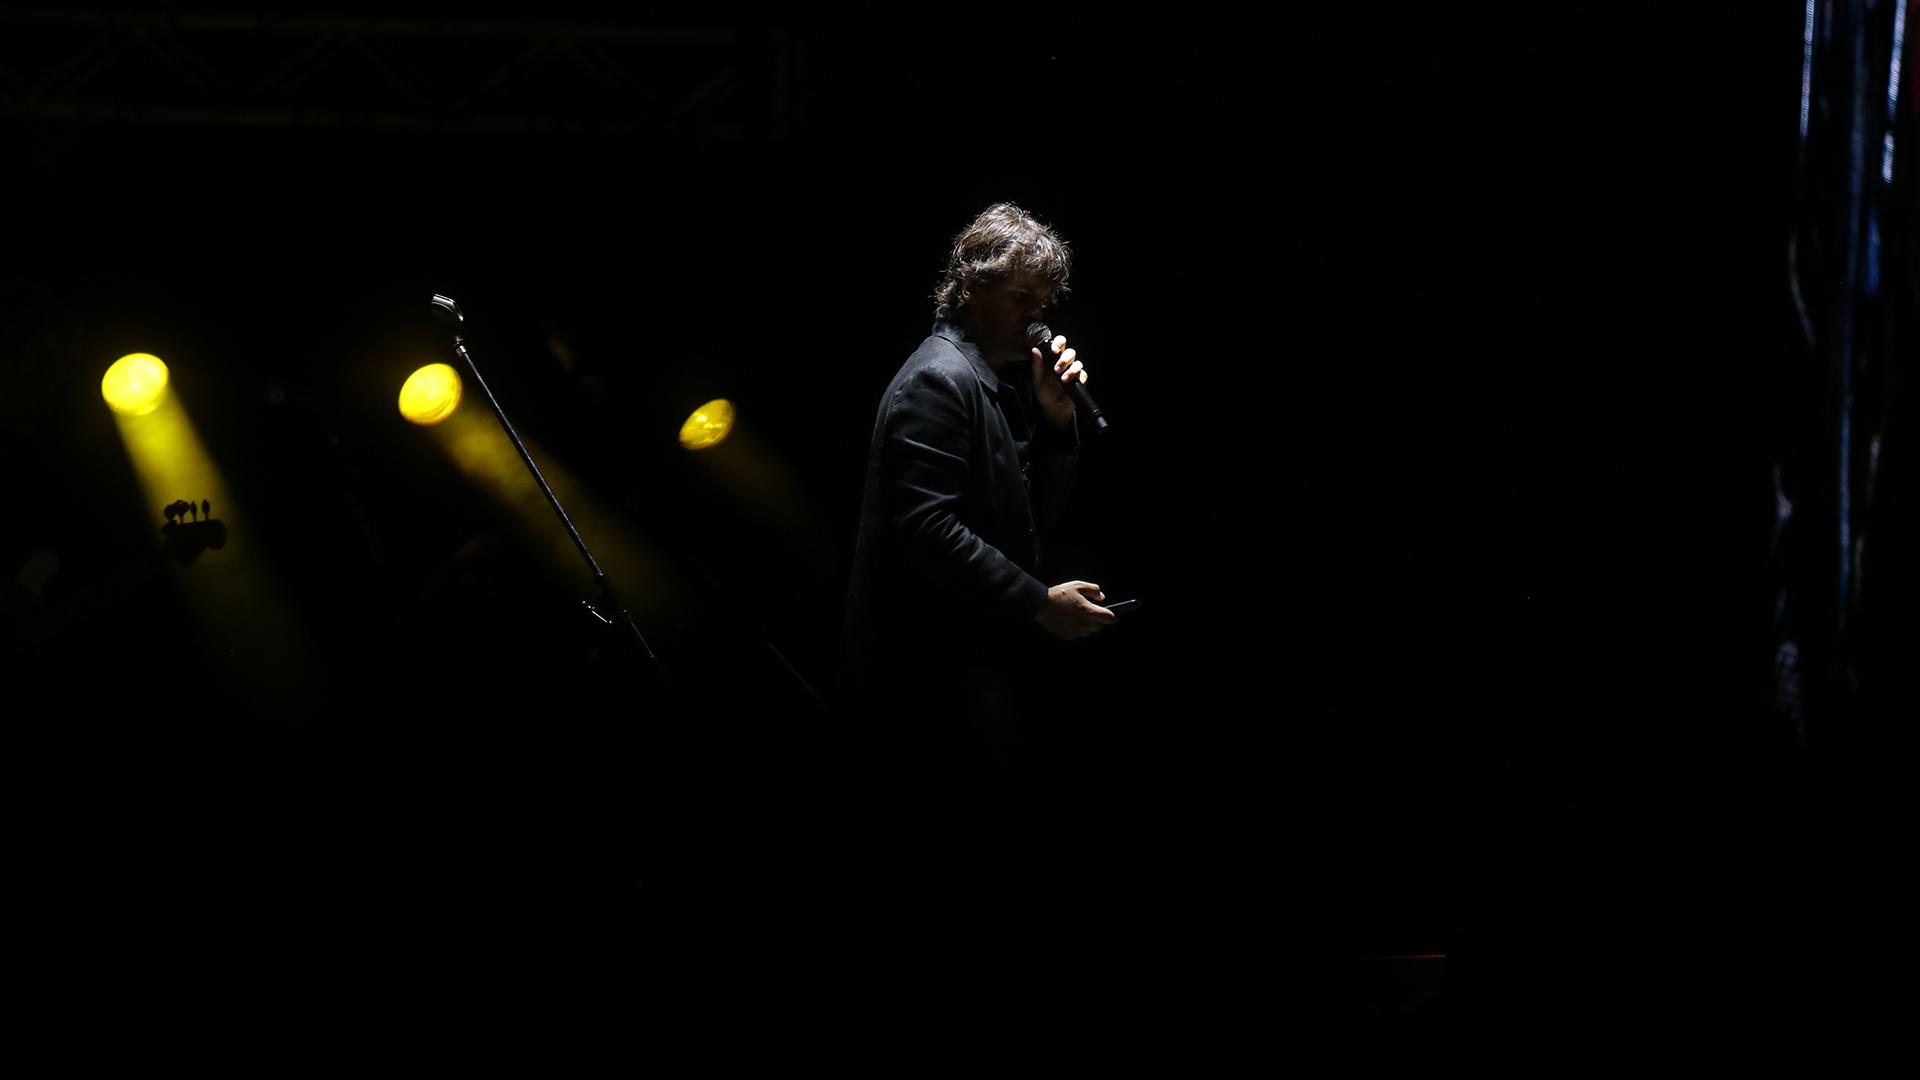 (Fotos: Joaquin Pedroso/Teleshow)